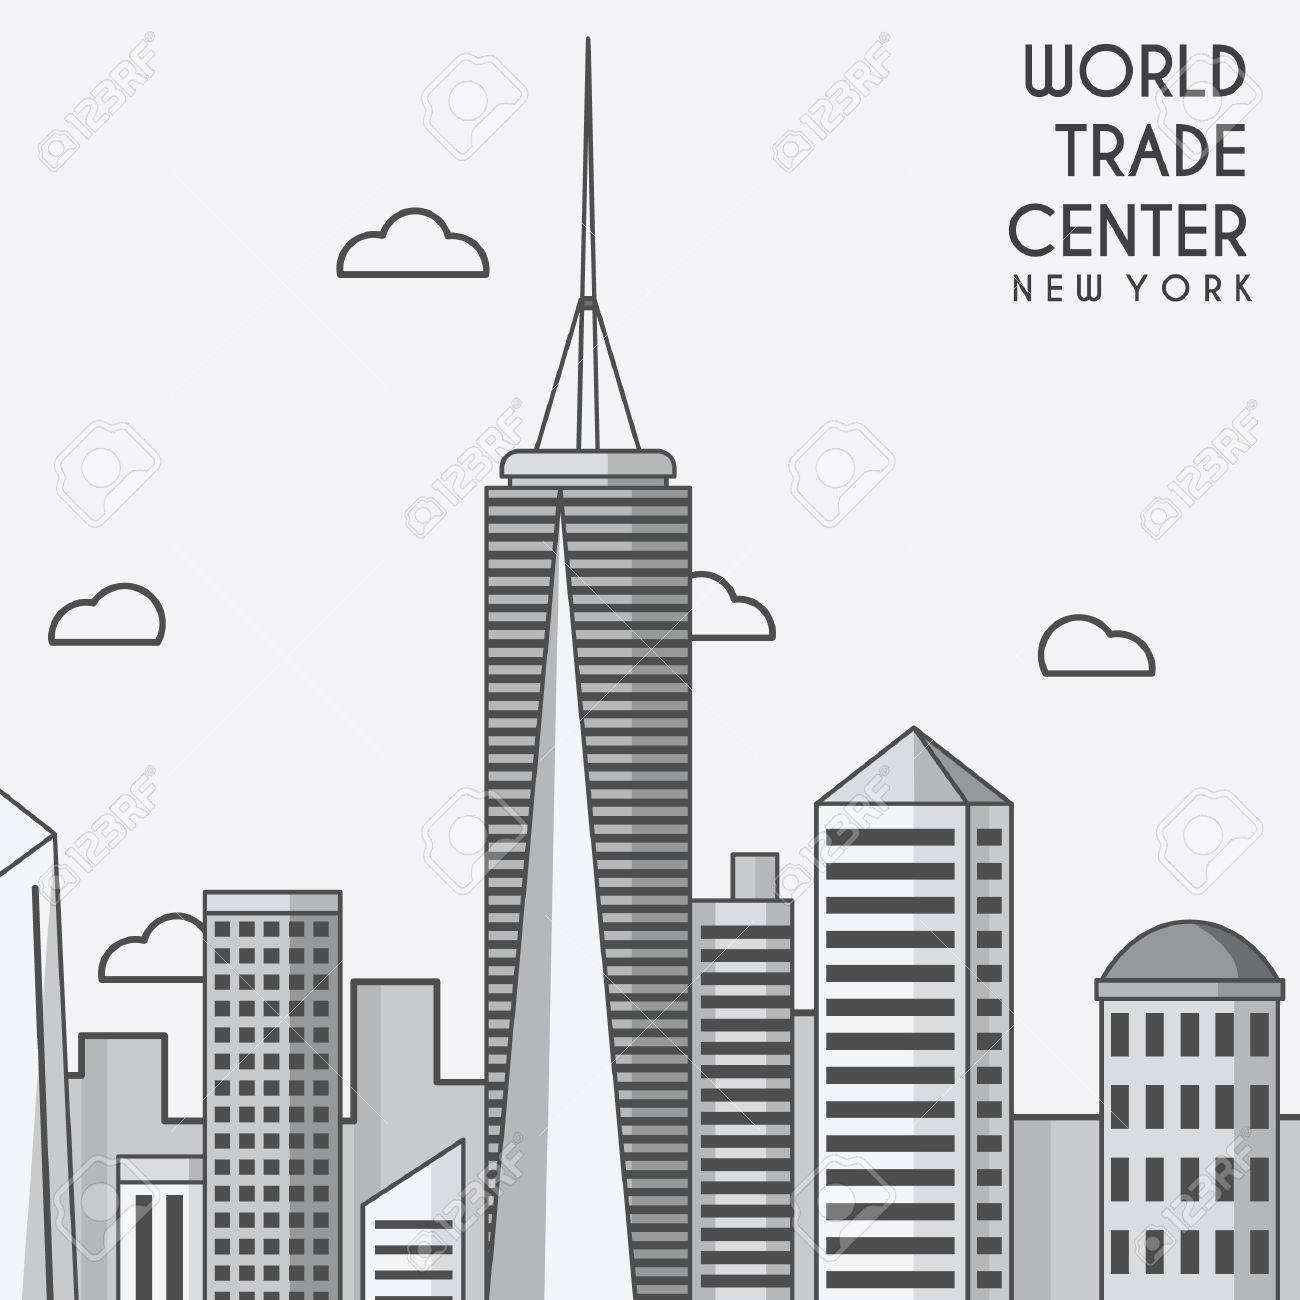 world trade center - 51360874